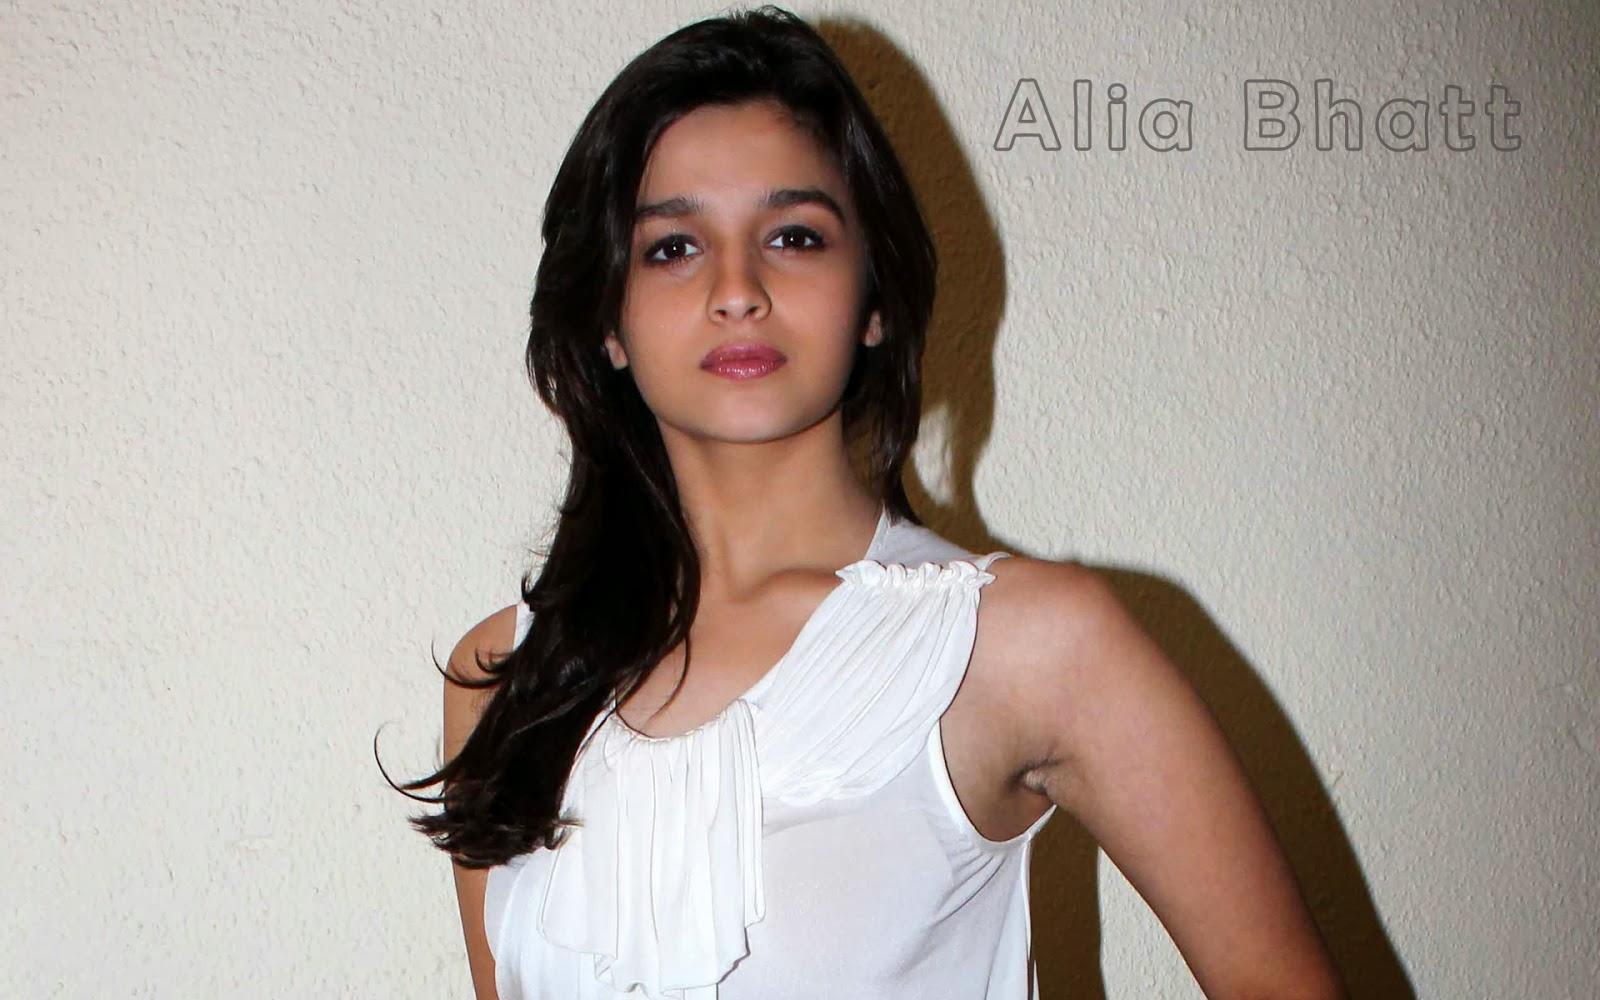 Alia Bhatt Latest Hot Wallpaper Gallery - Alia Bhatt -7651